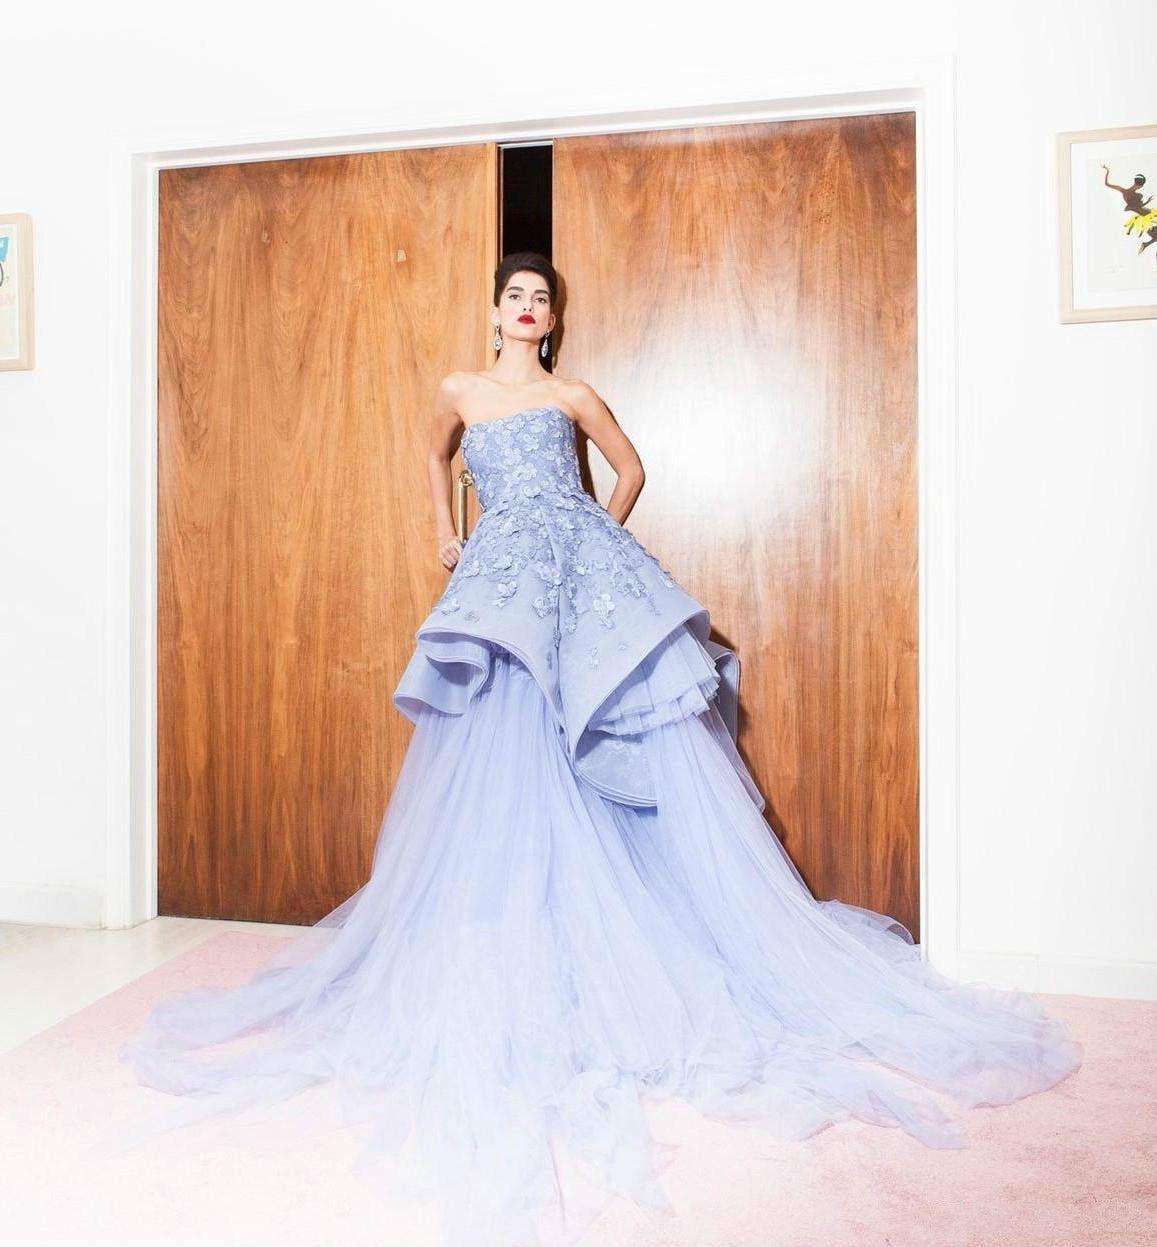 2020 Elie Saab Evening Dresses Long Strapless Appliques Party Wear Tulle Tiered A Line Formal Prom Dress robes de soirée